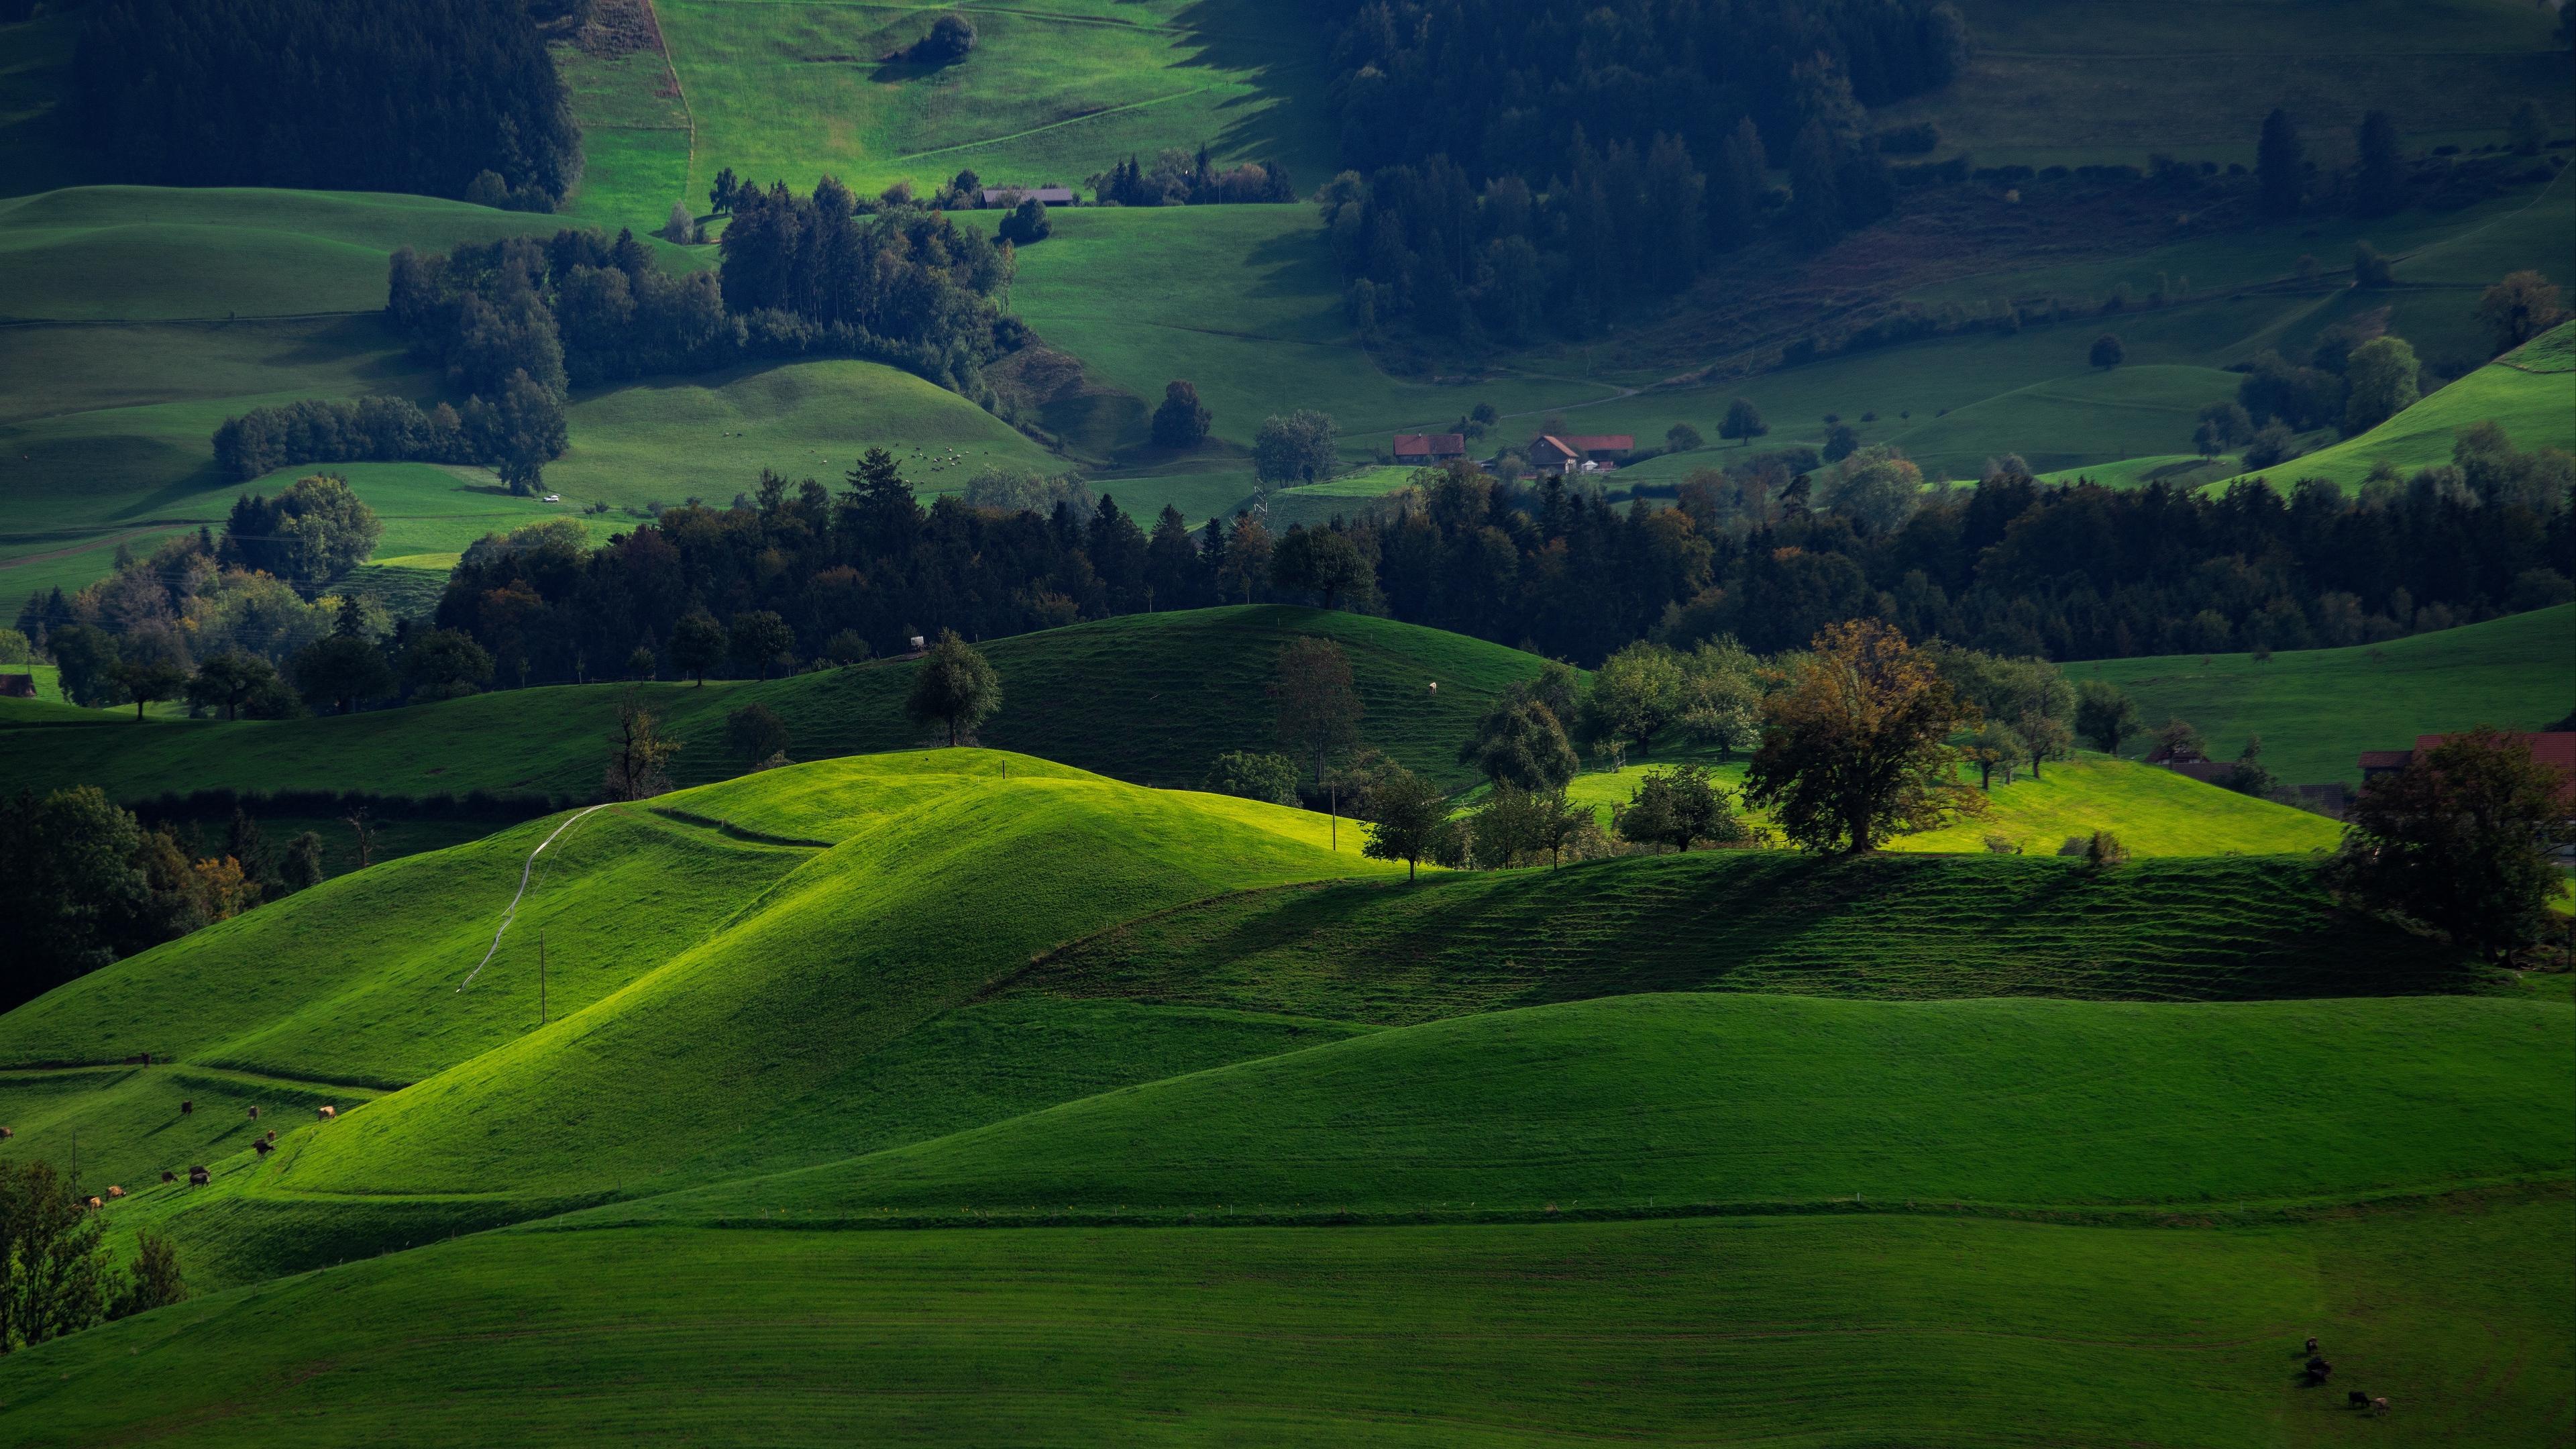 valley green field hirzel switzerland 4k 1541113683 - valley, green, field, hirzel, switzerland 4k - Valley, green, Field